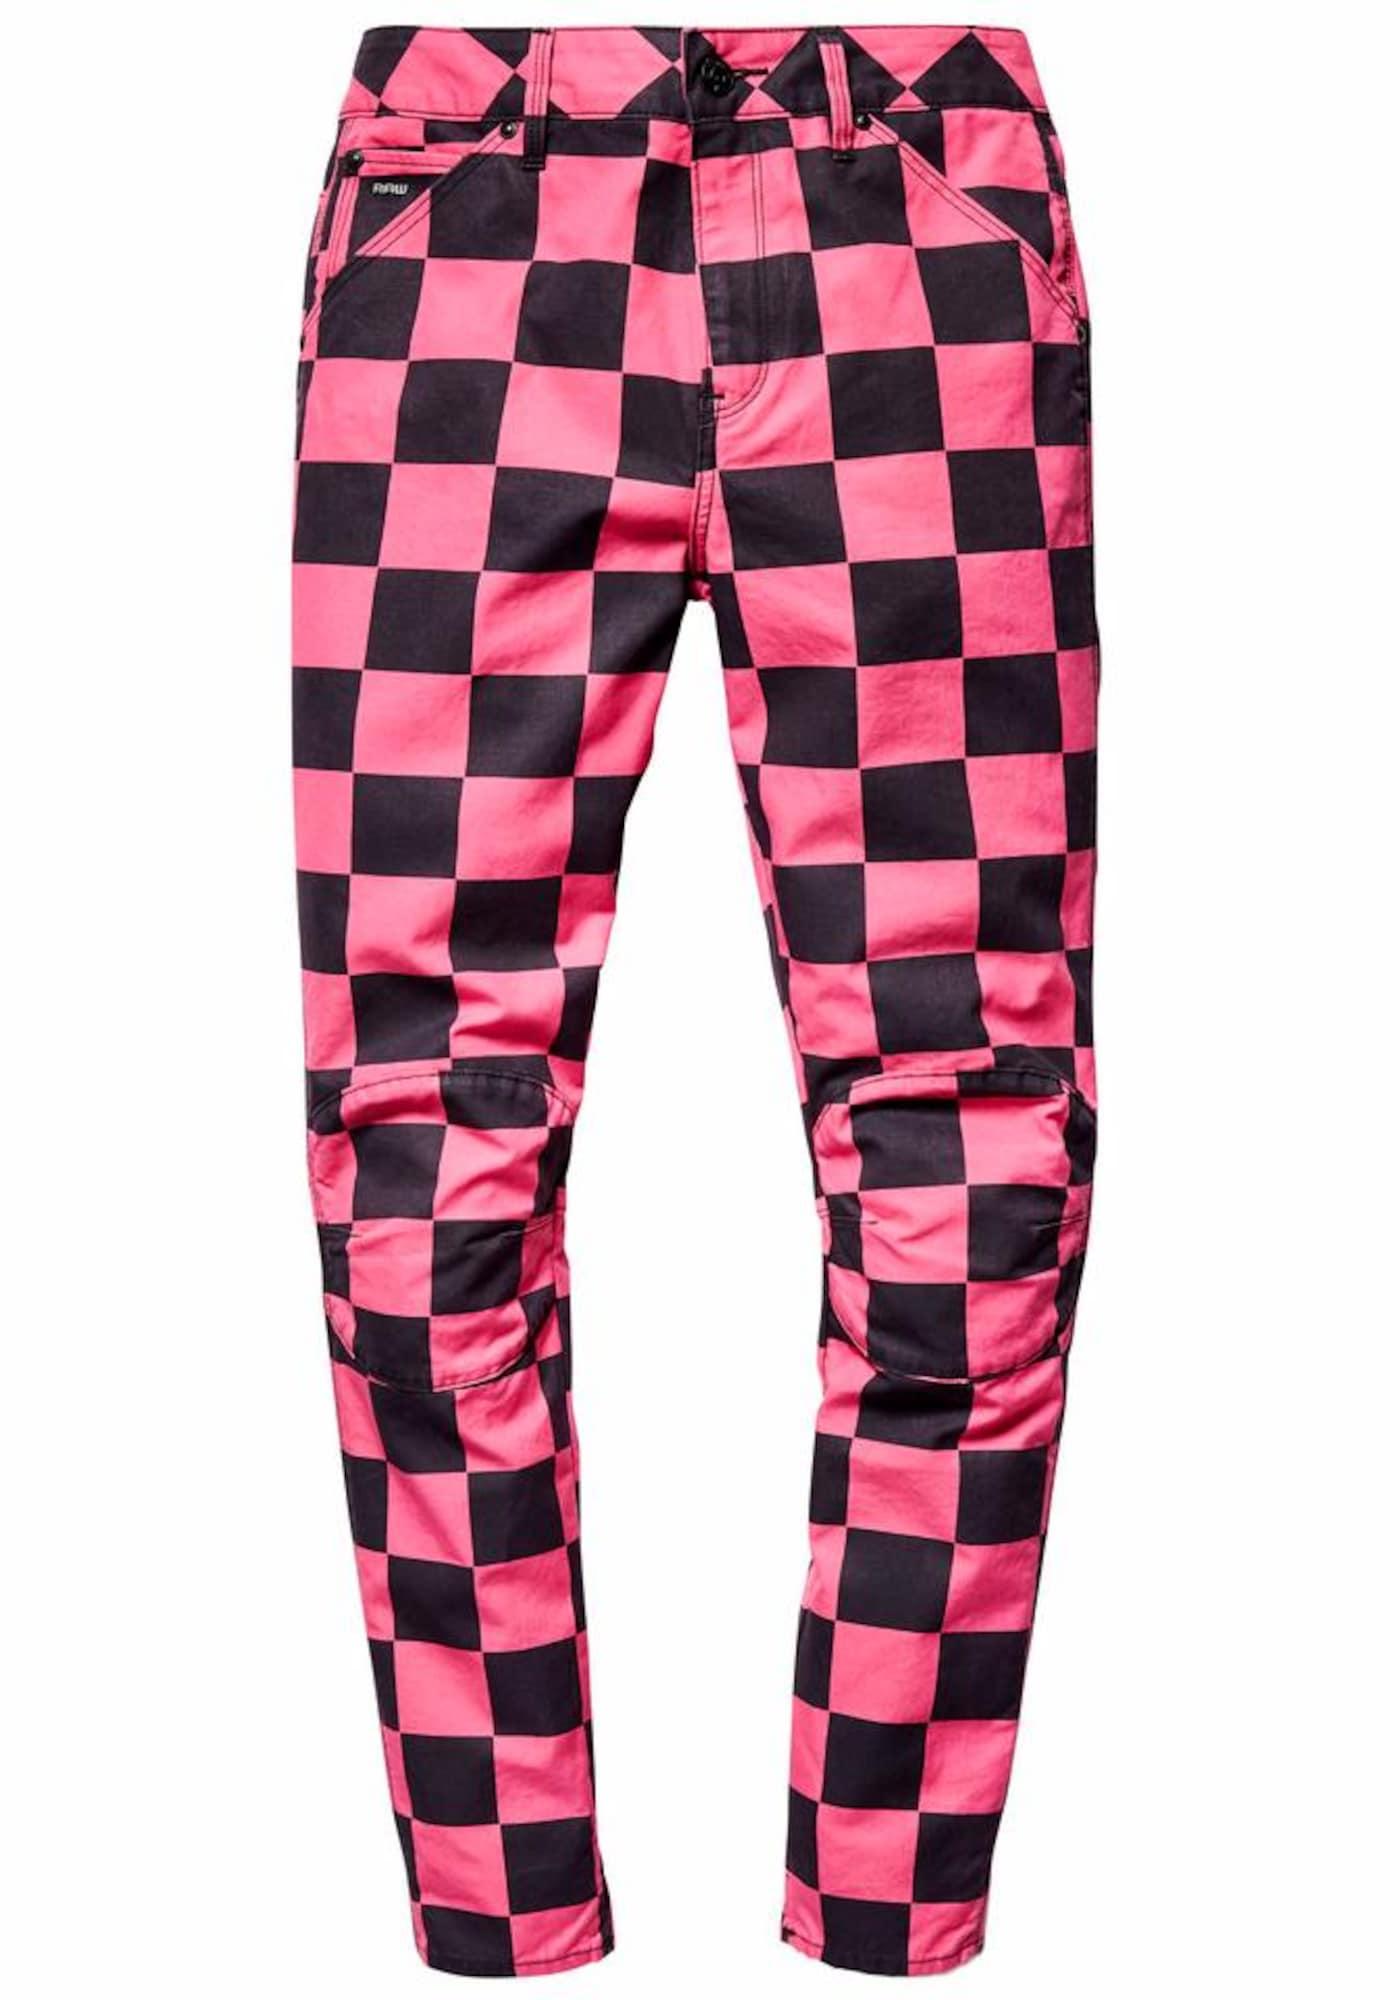 G-STAR RAW Dames Jeans pink zwart